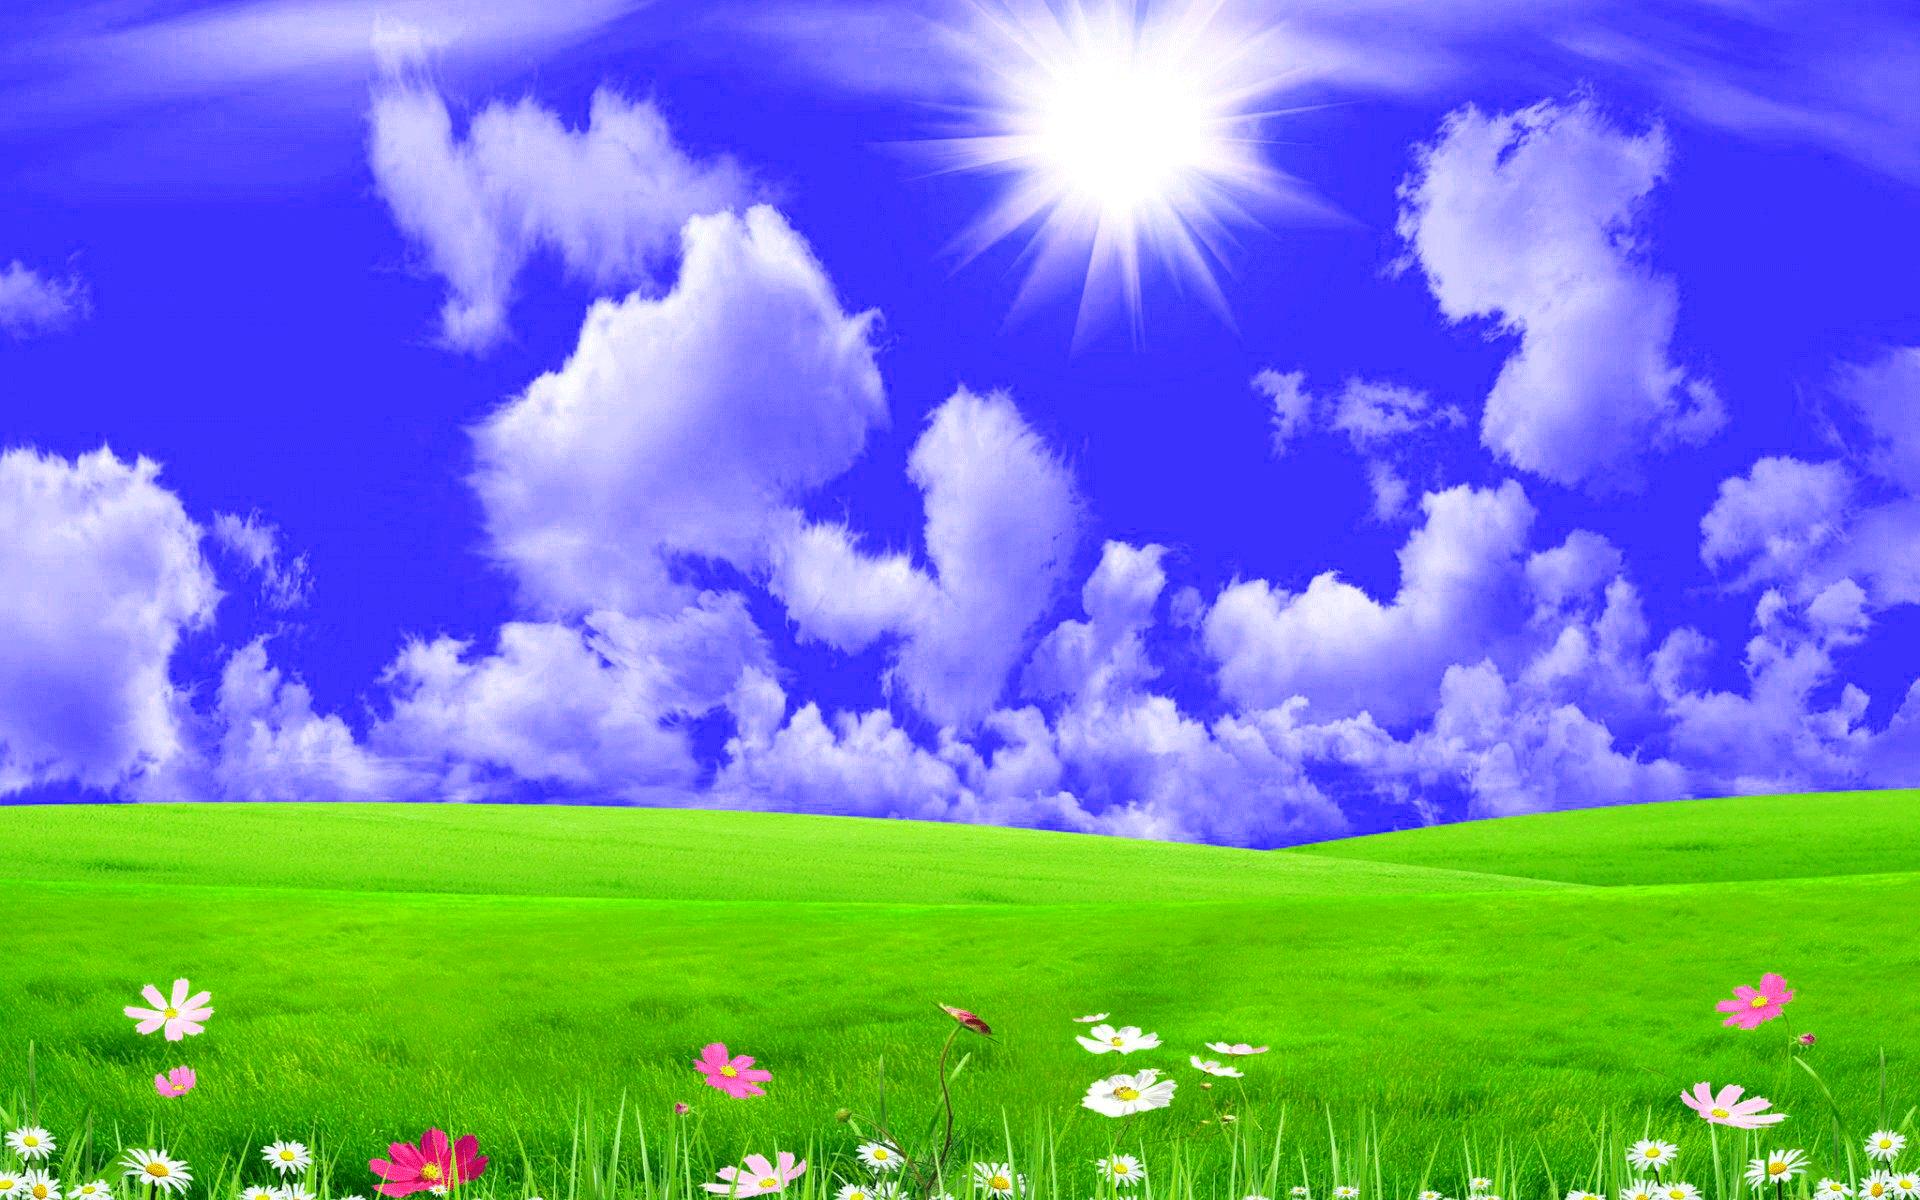 Hd Beautiful Nature Wallpapers And Photos Hd Landscape Wallpapers Beautiful Nature Wallpaper Nature Wallpaper Sunshine Wallpaper